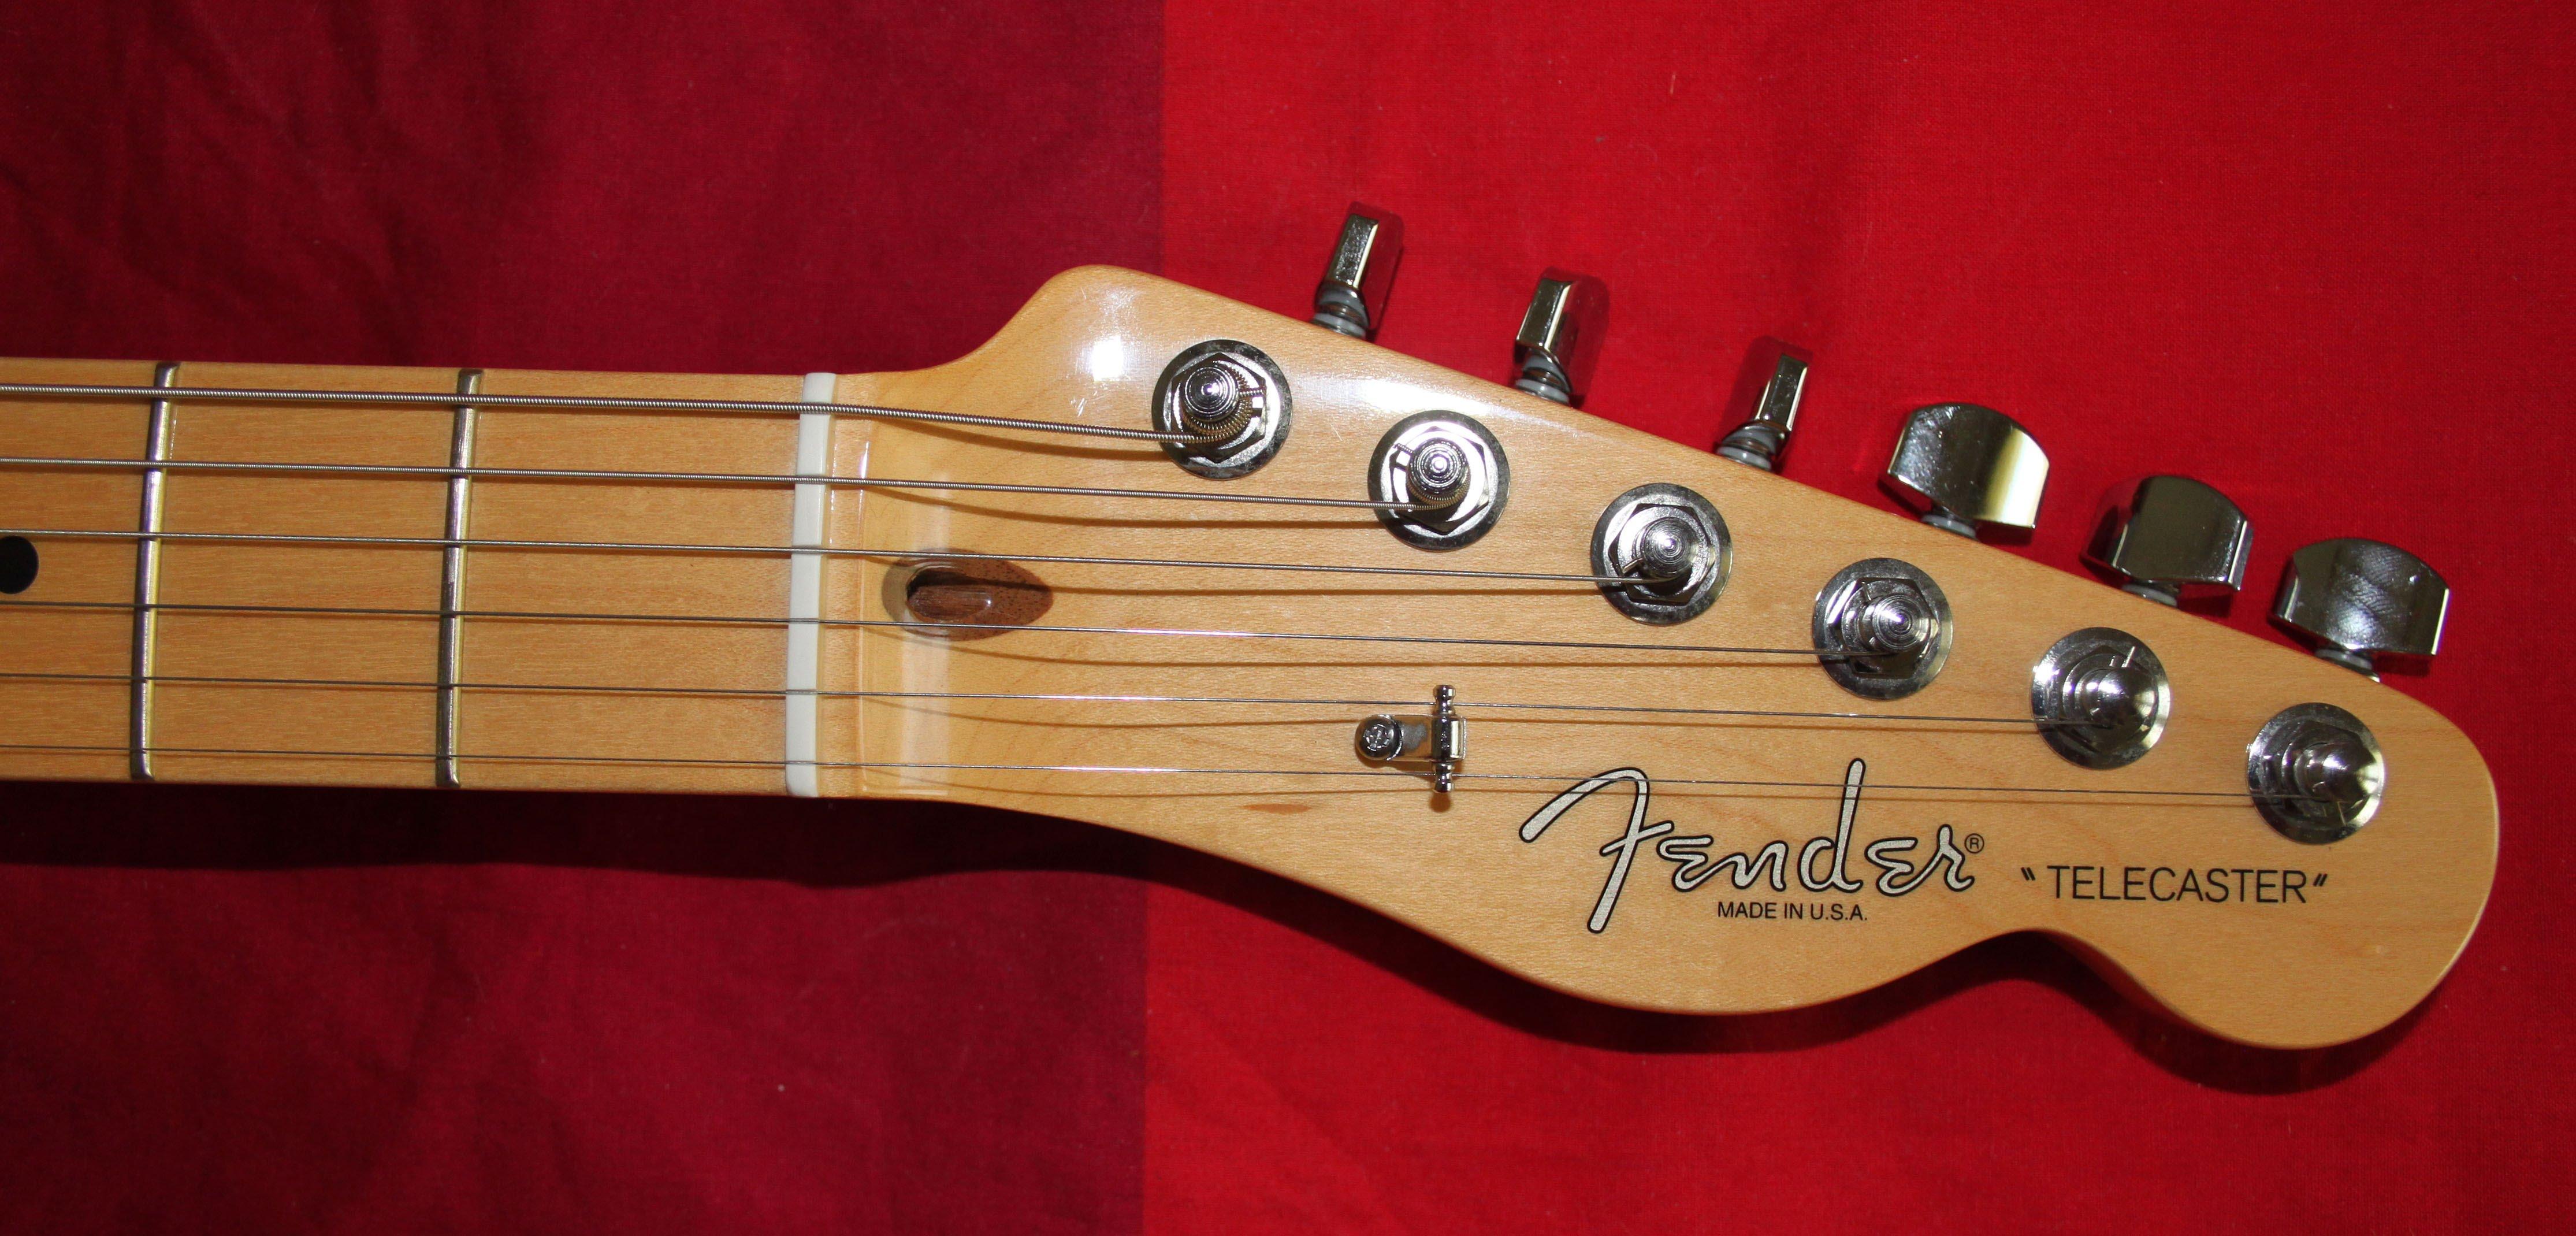 Fender Telecaster american standard